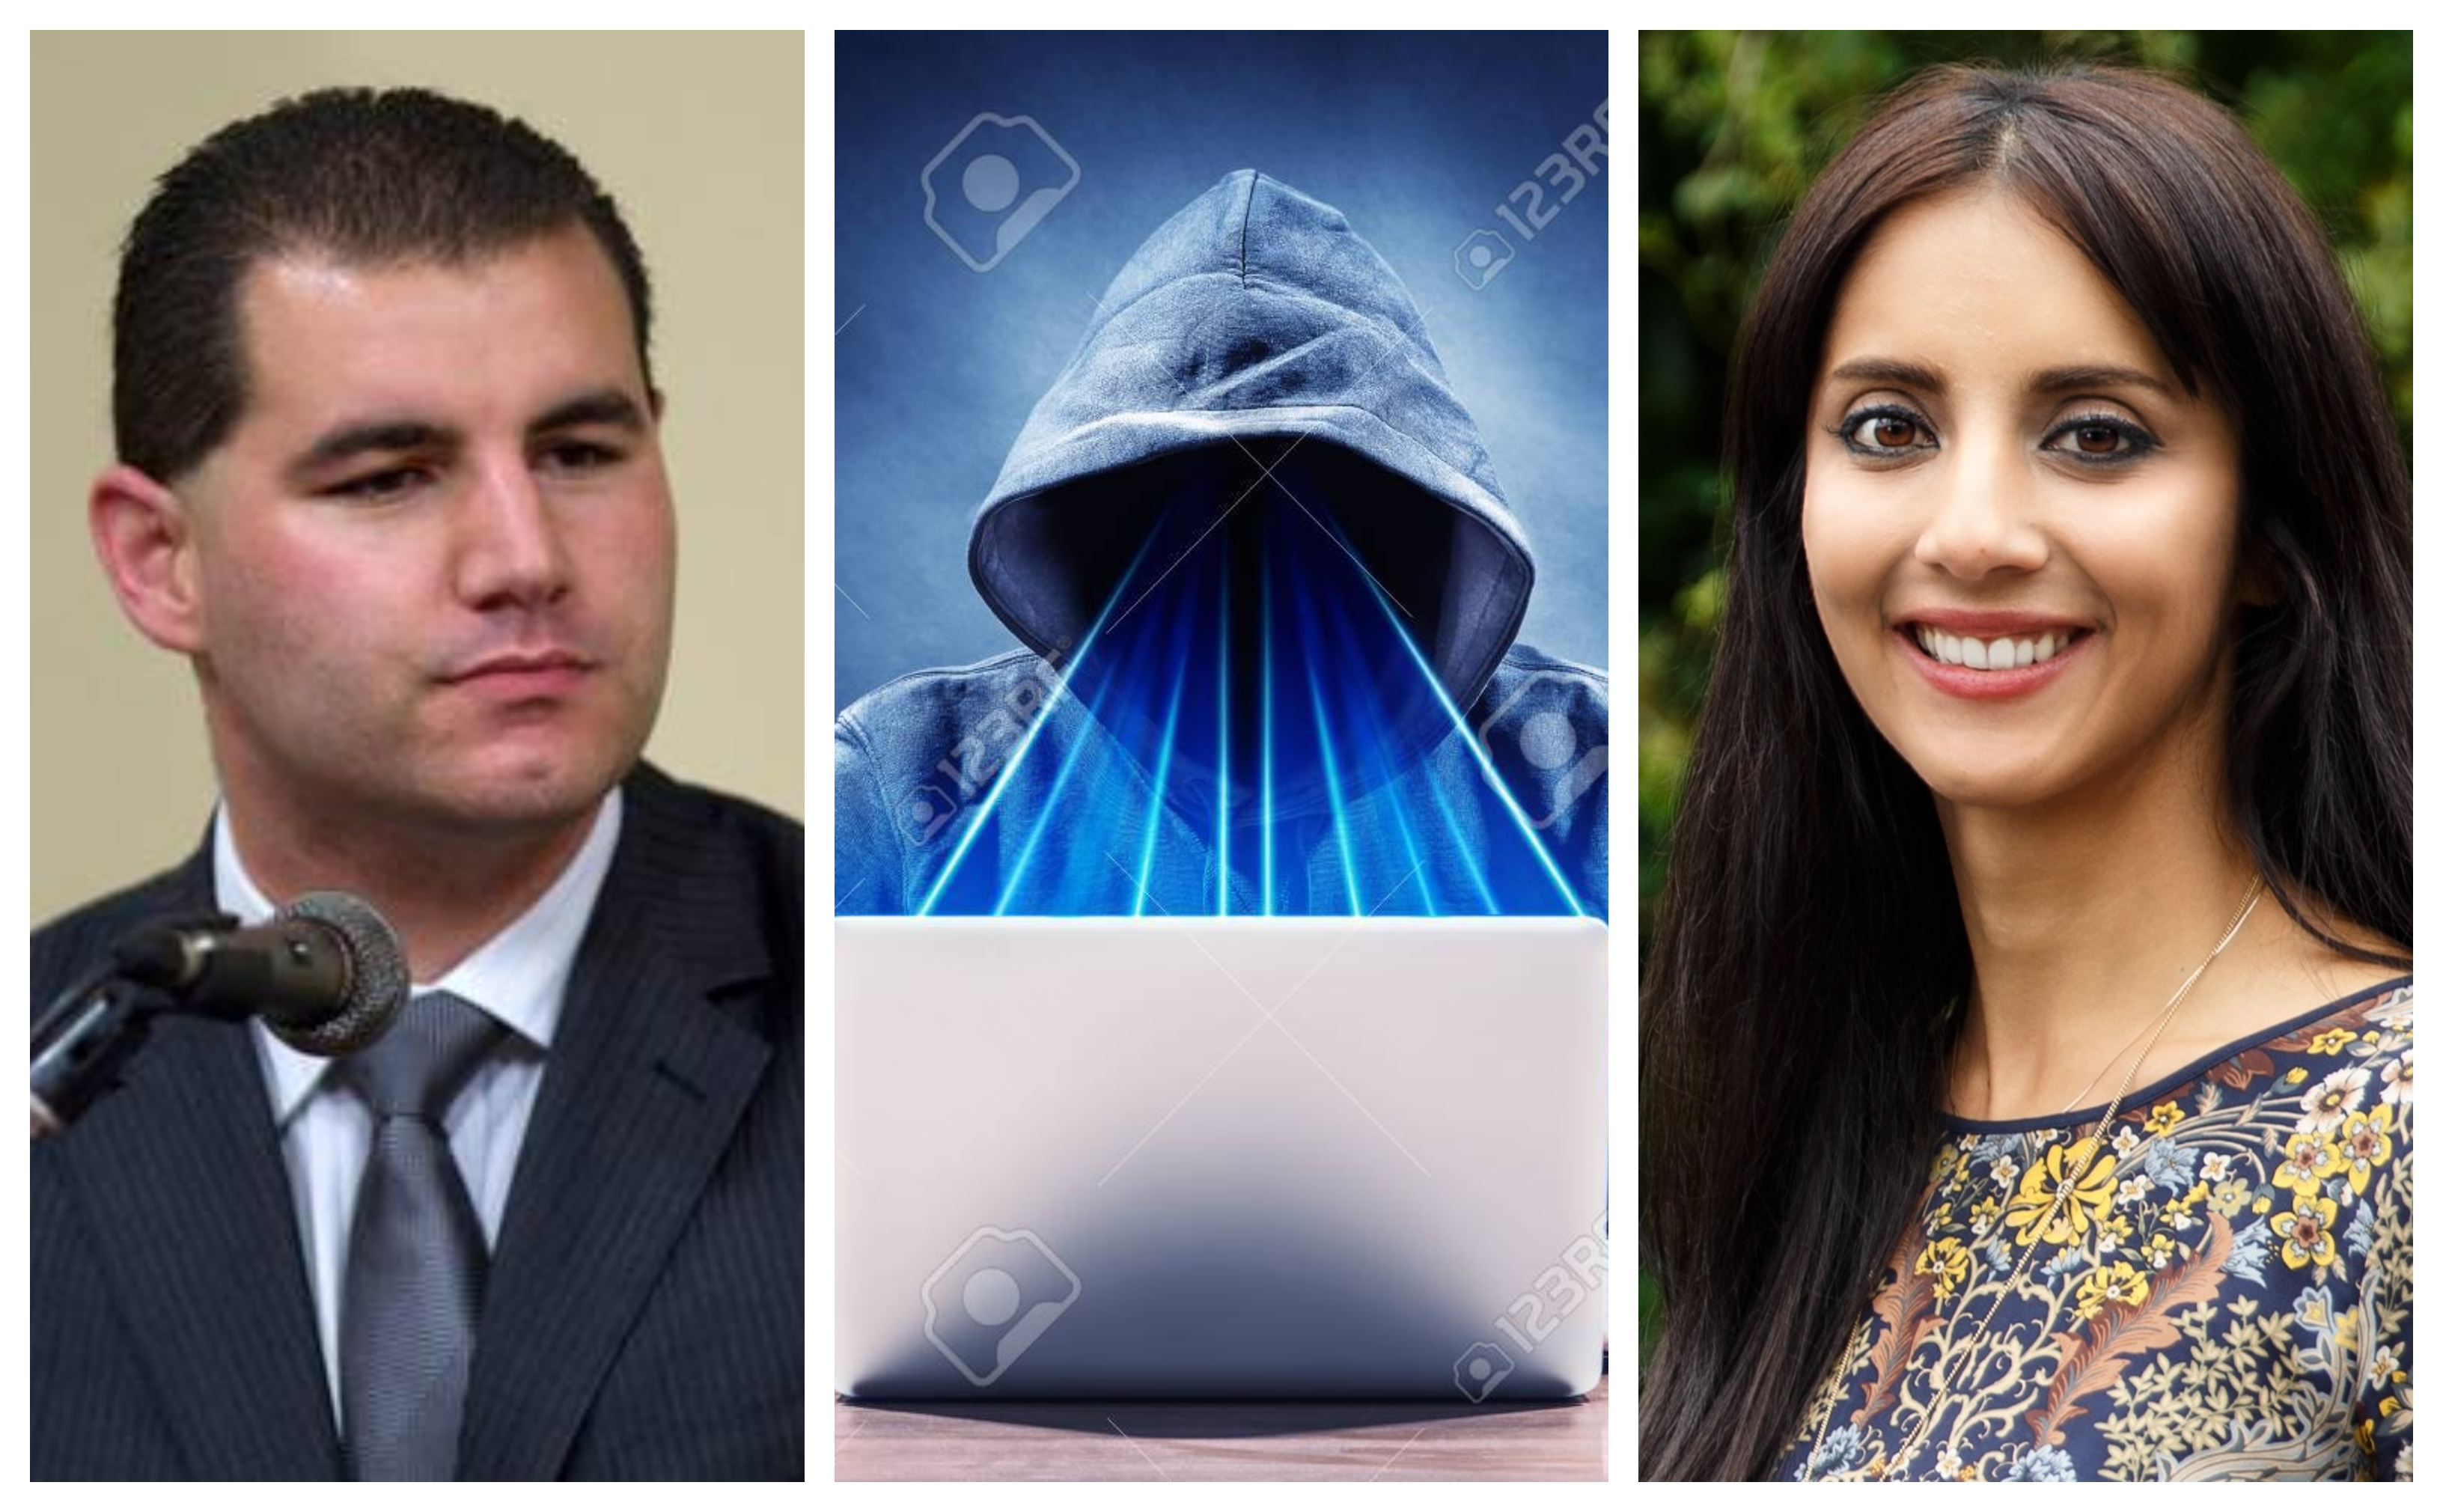 Jami-Lee Ross, Golriz Ghahraman on electoral reform